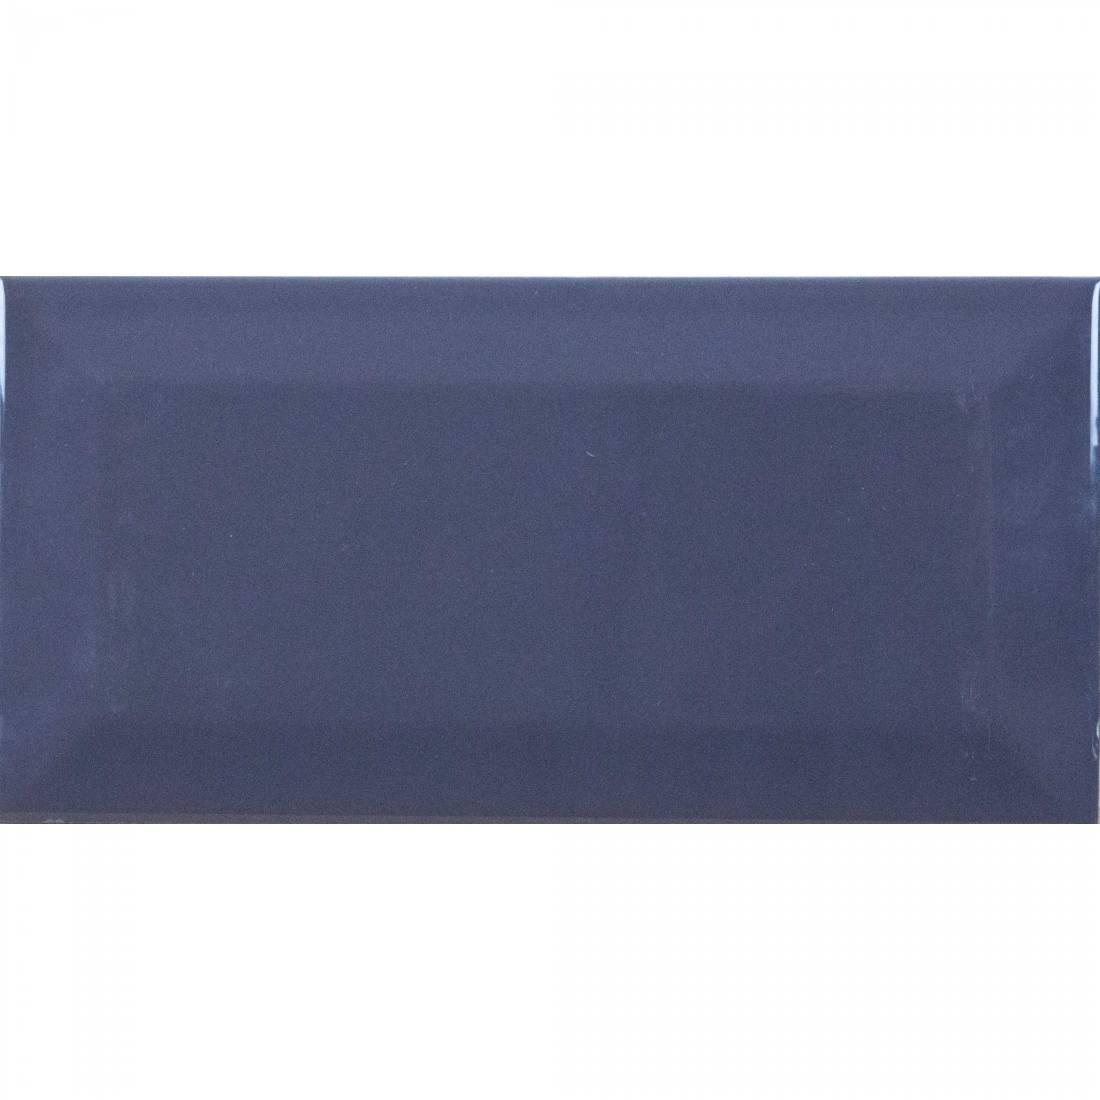 Bevelled 10x20 Grey Gloss 1